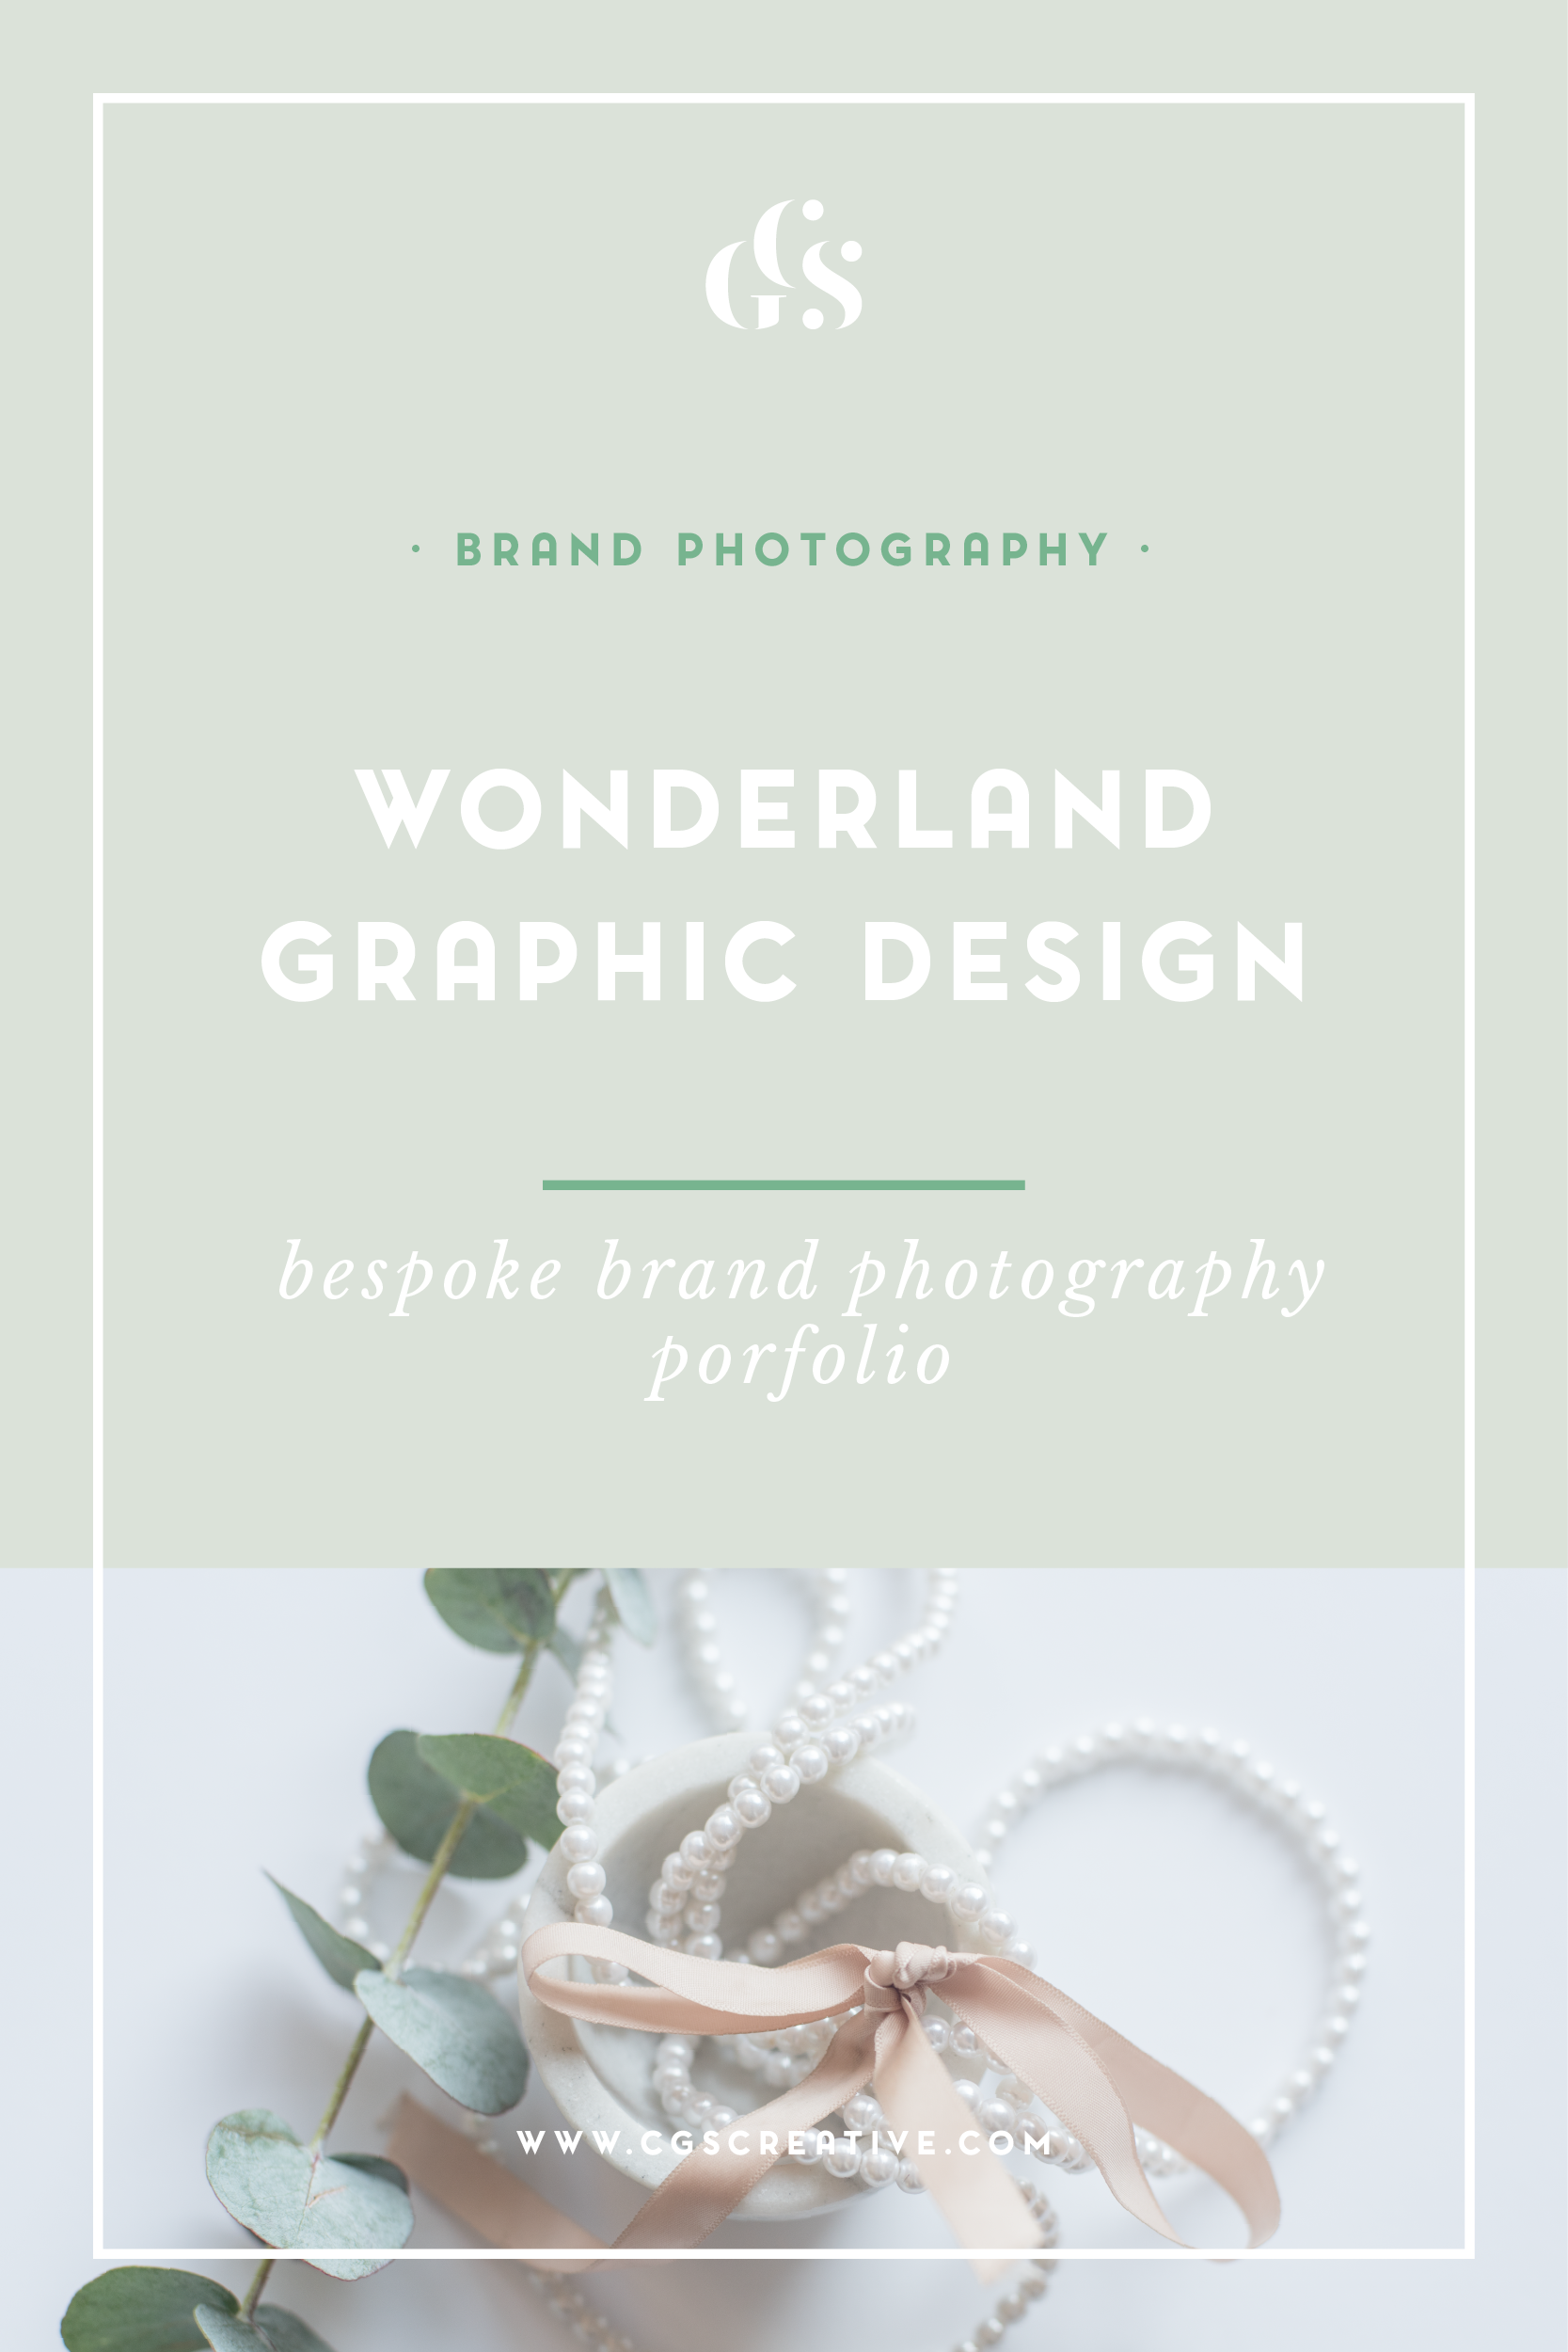 Bespoke Brand Photography by CGScreative